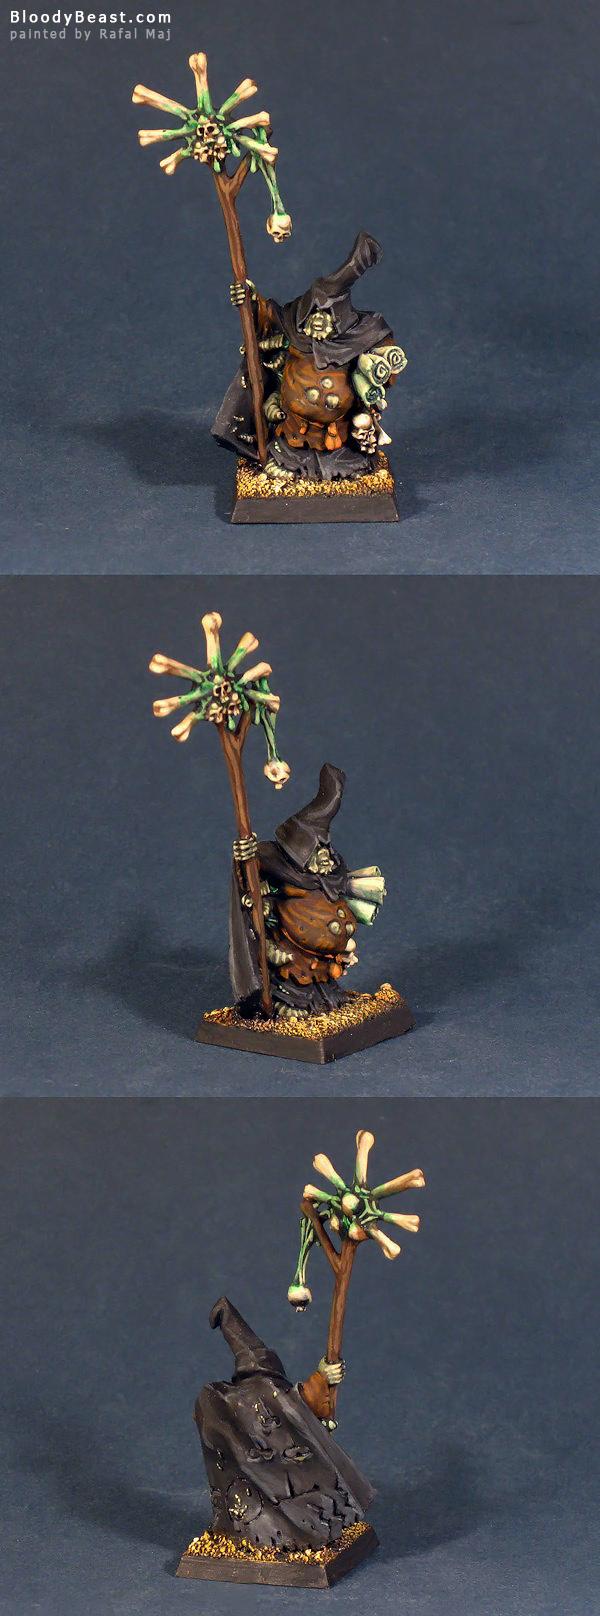 Chaos Sorcerer of Nurgle painted by Rafal Maj (BloodyBeast.com)